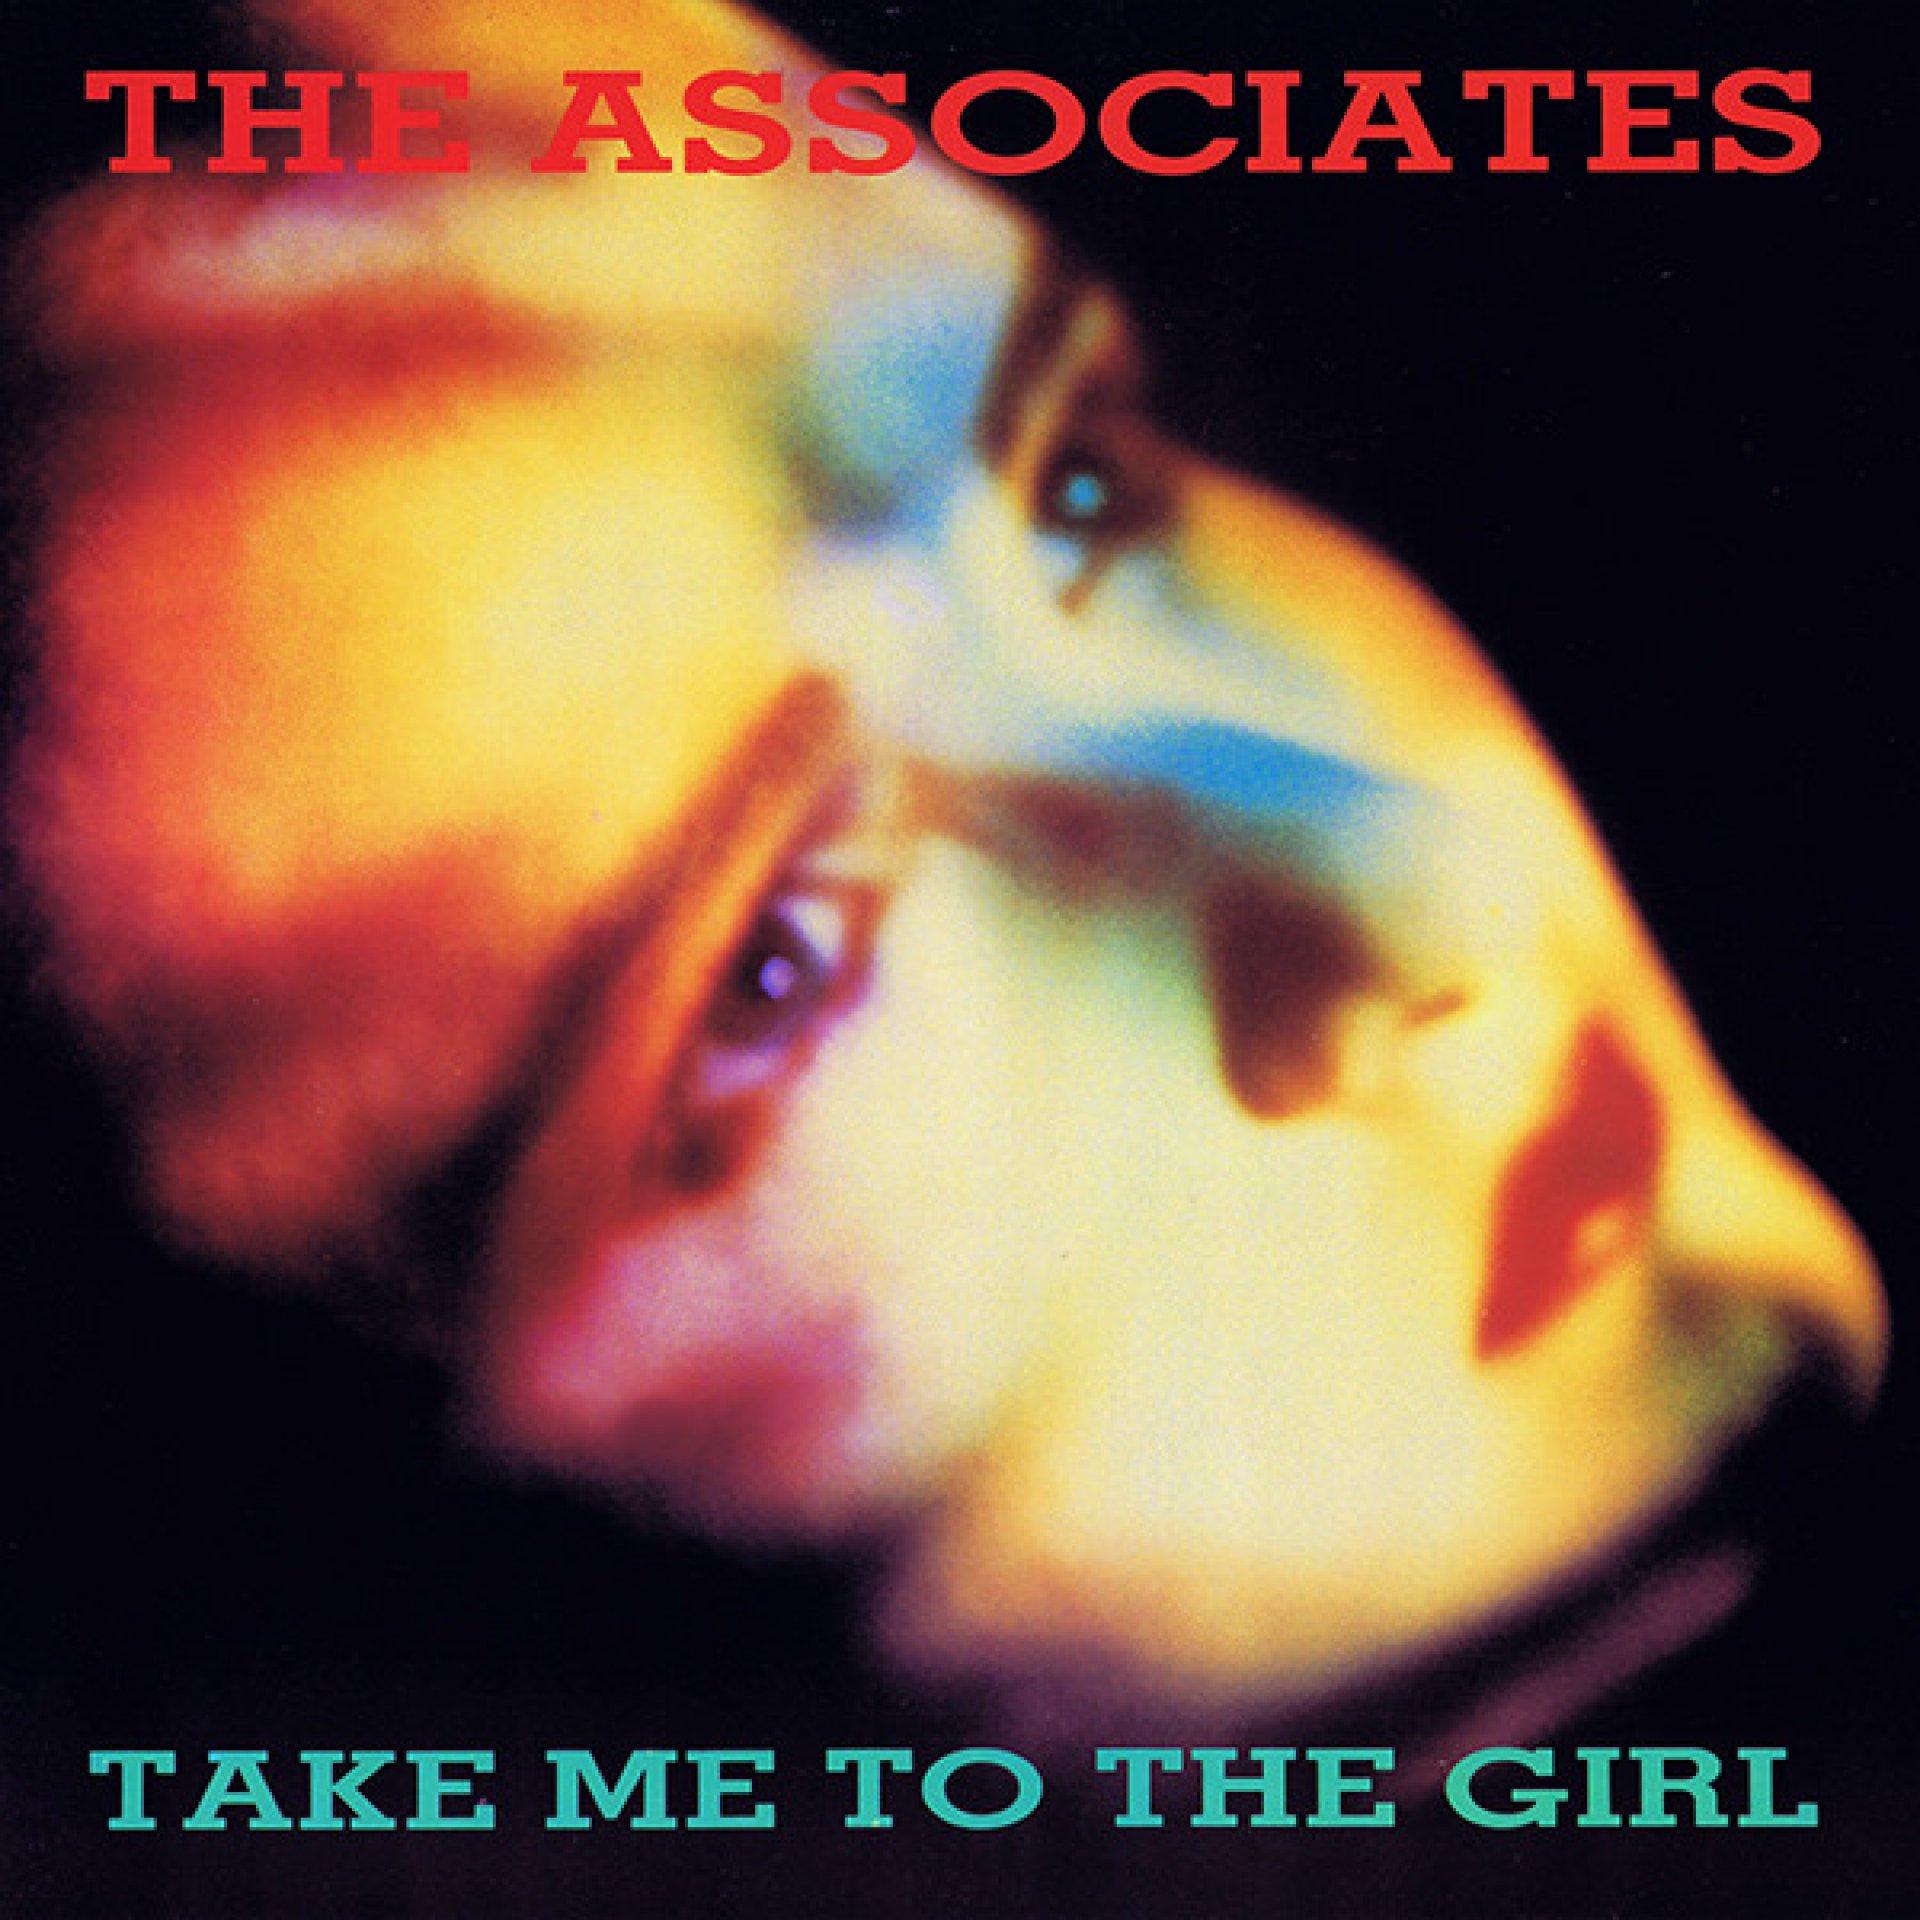 The Associates Take Me To The Girl